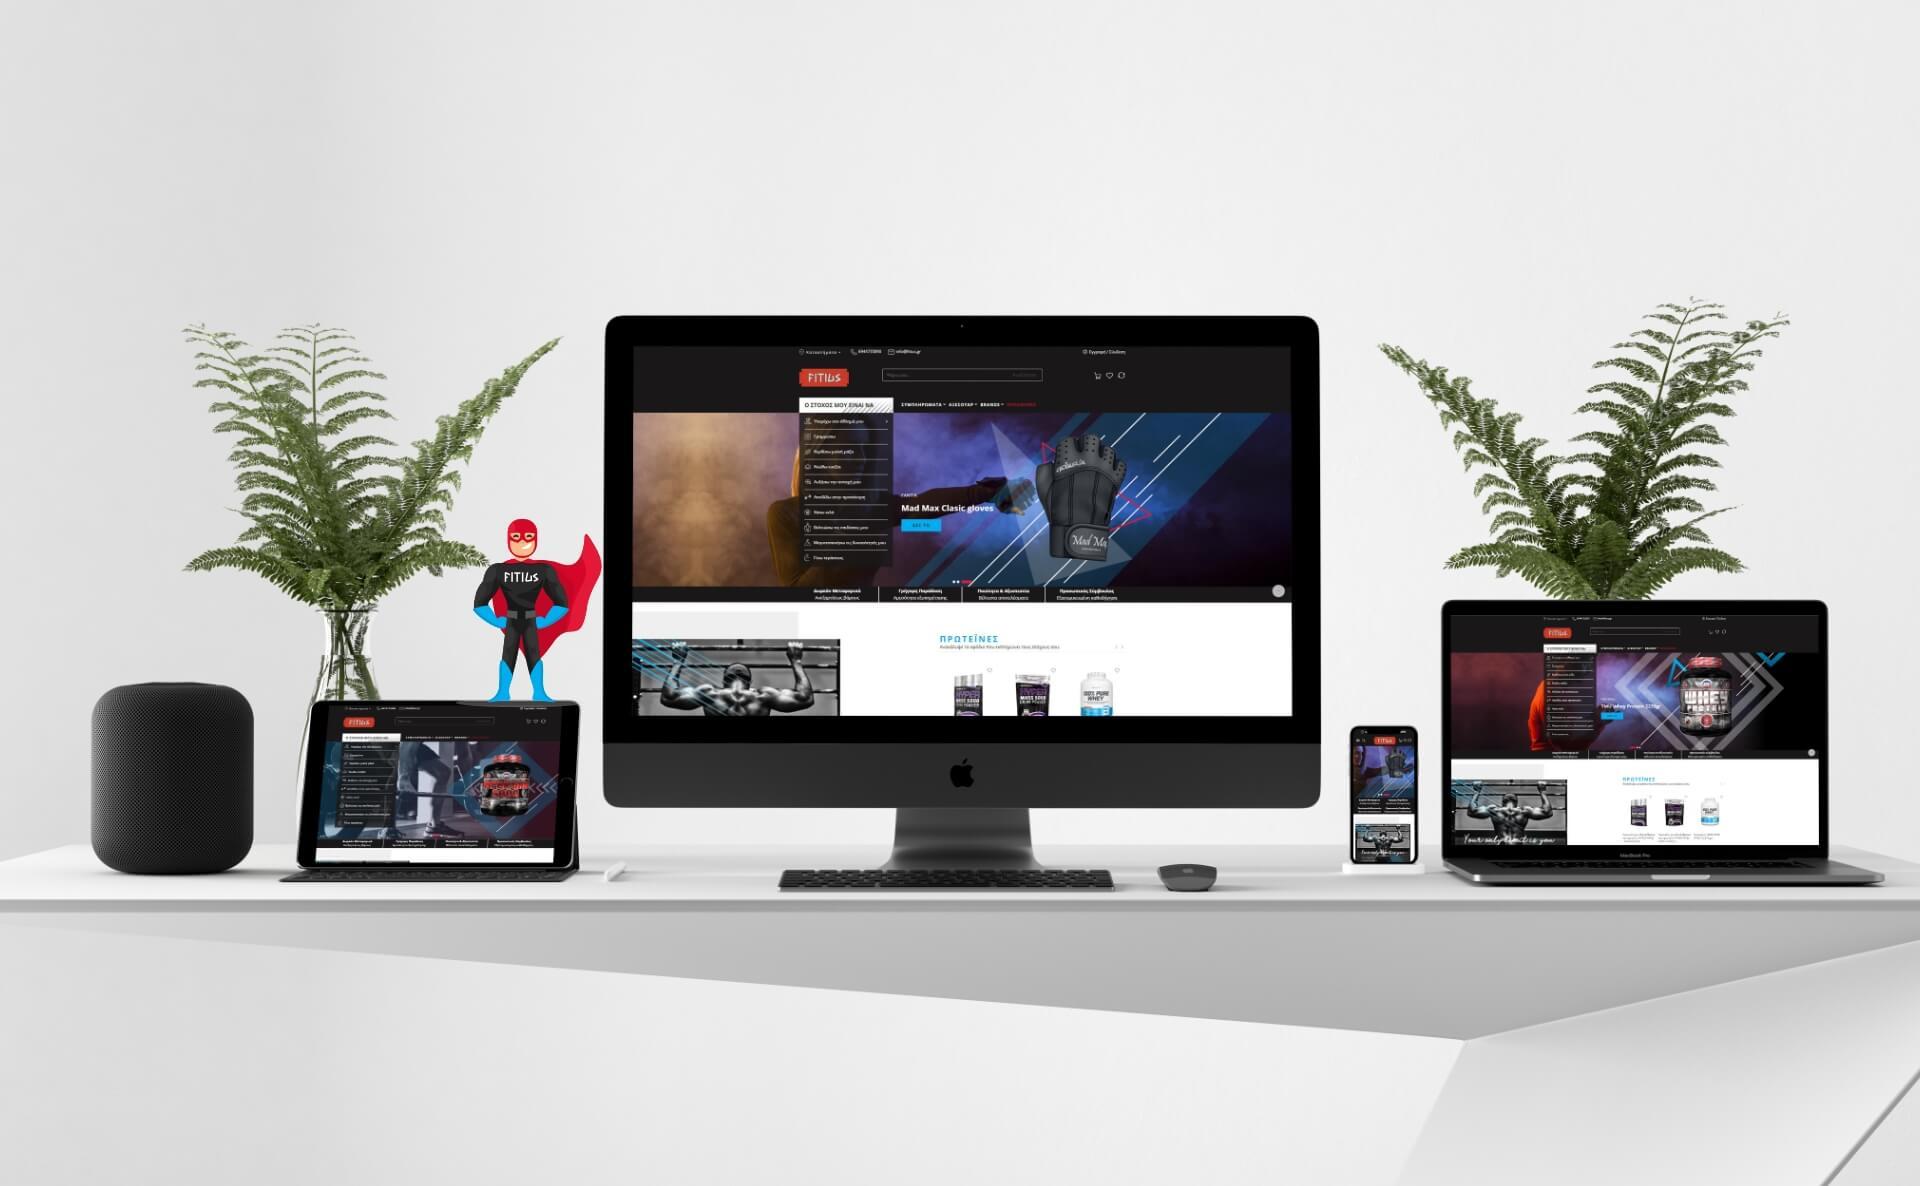 Fitius website view